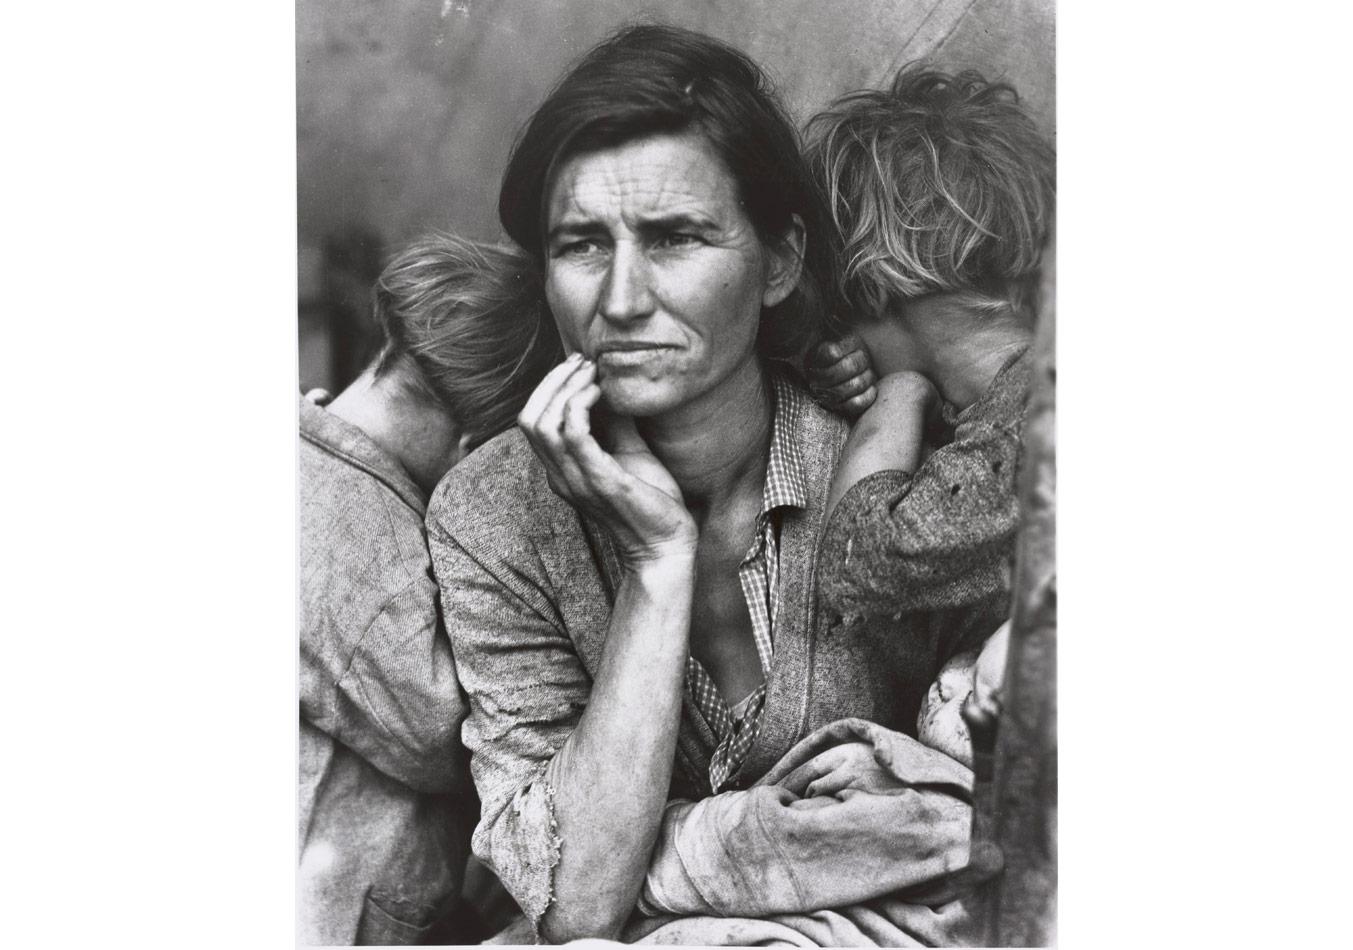 Dorothea Lange (1895-1965), Kaliforniya'da insan erozyonu (Göçmen Anne) © Münchner Stadtmuseum, Sammlung Fotografie © Dorothea Lange Collection, Oakland Museum, Oakland, ABD